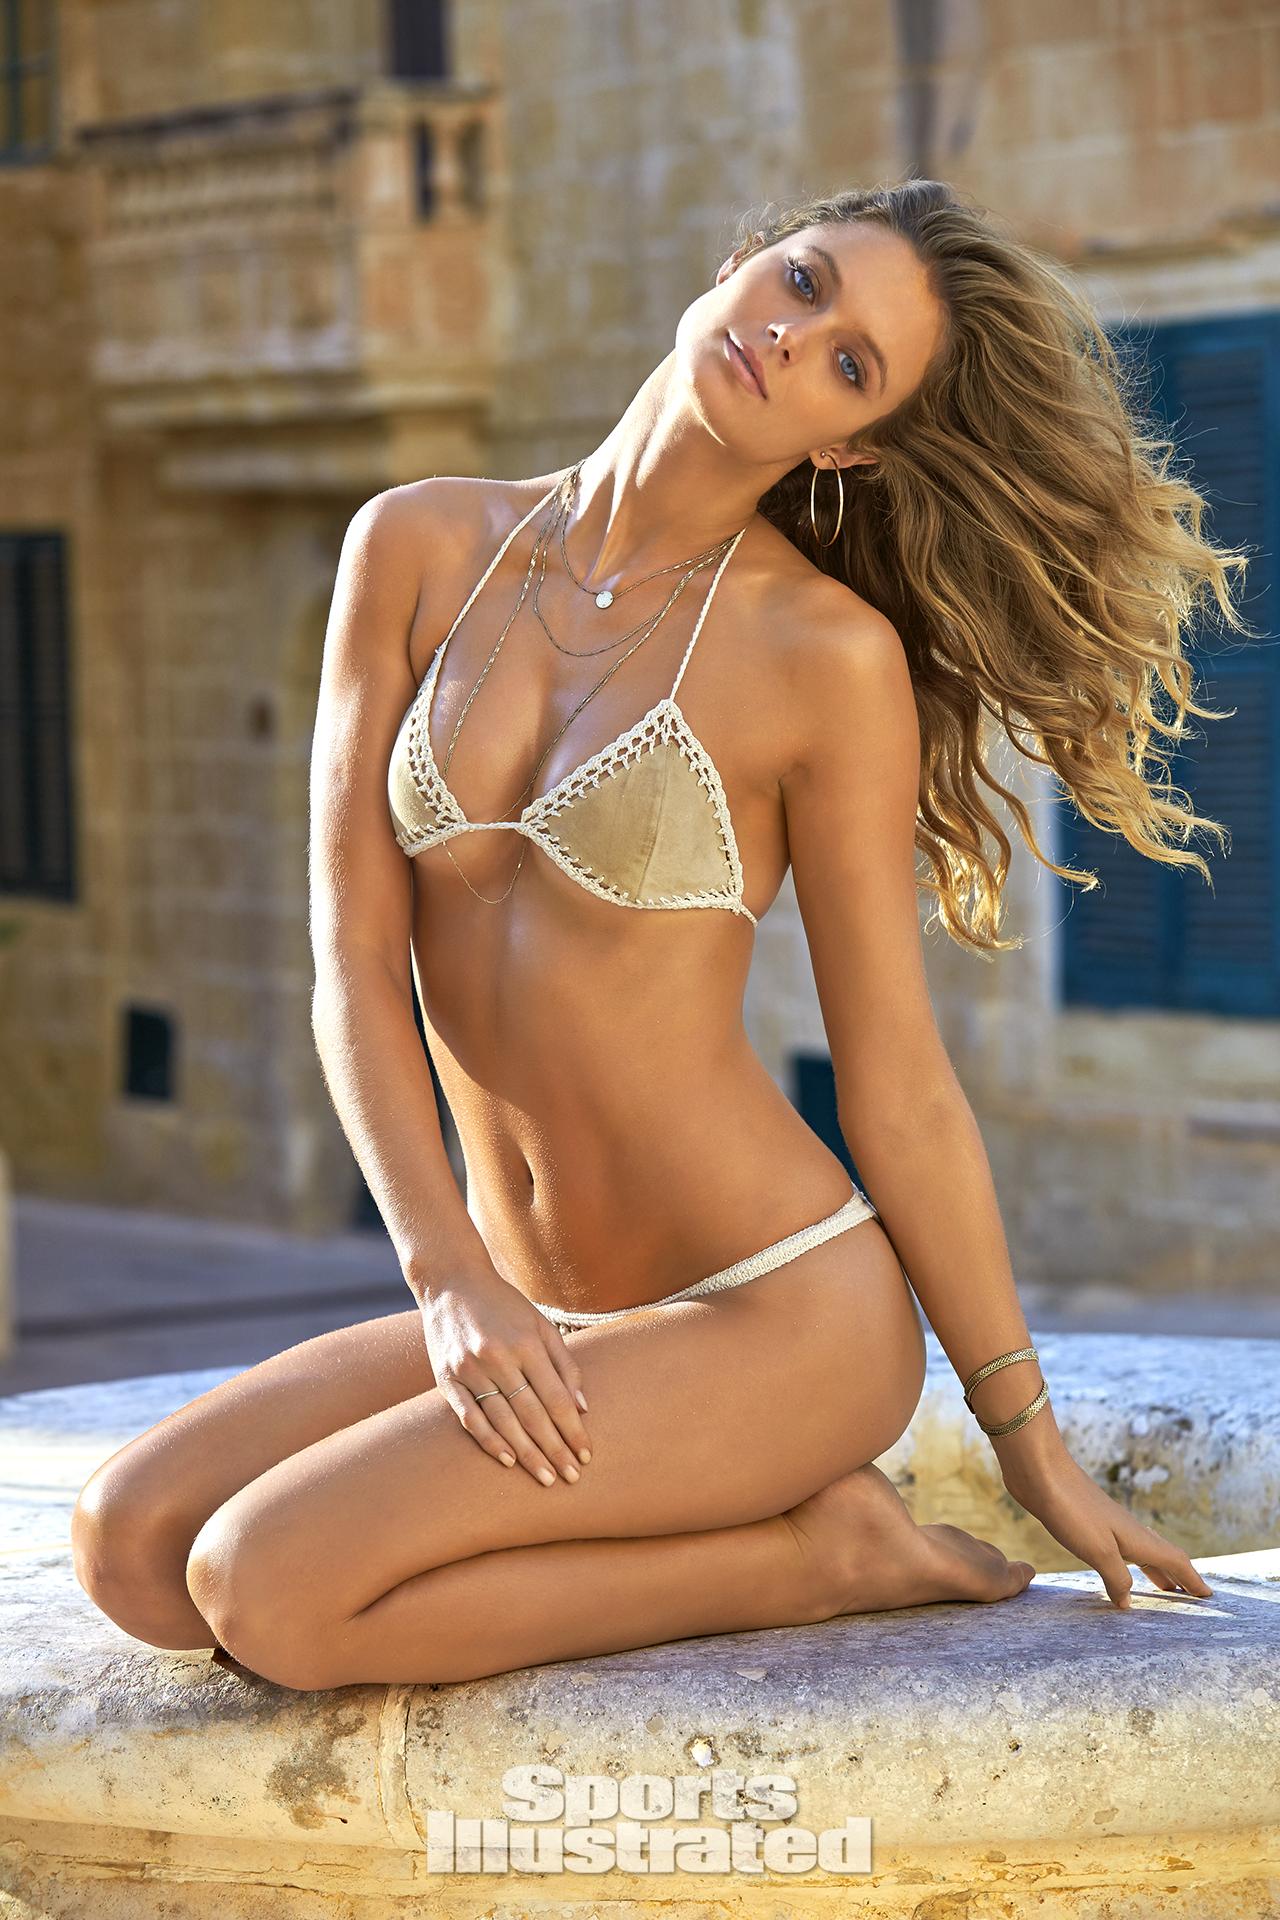 Kate Bock was photographed by Ben Watts in Malta. Swimsuit by Susan Holmes Swimwear.